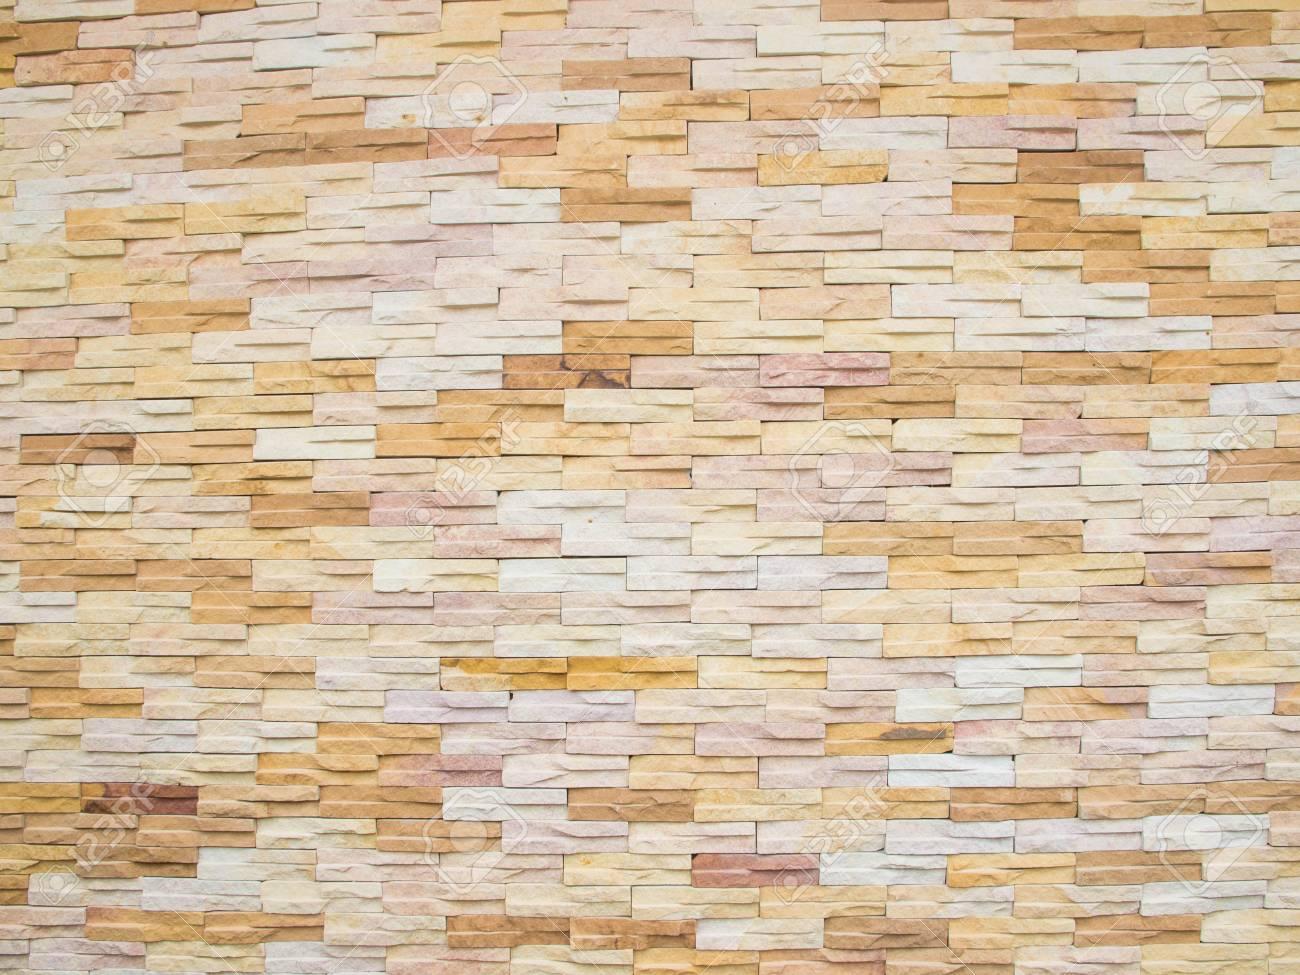 Texture Paint White Brick Wall Background Horizontal Architecture